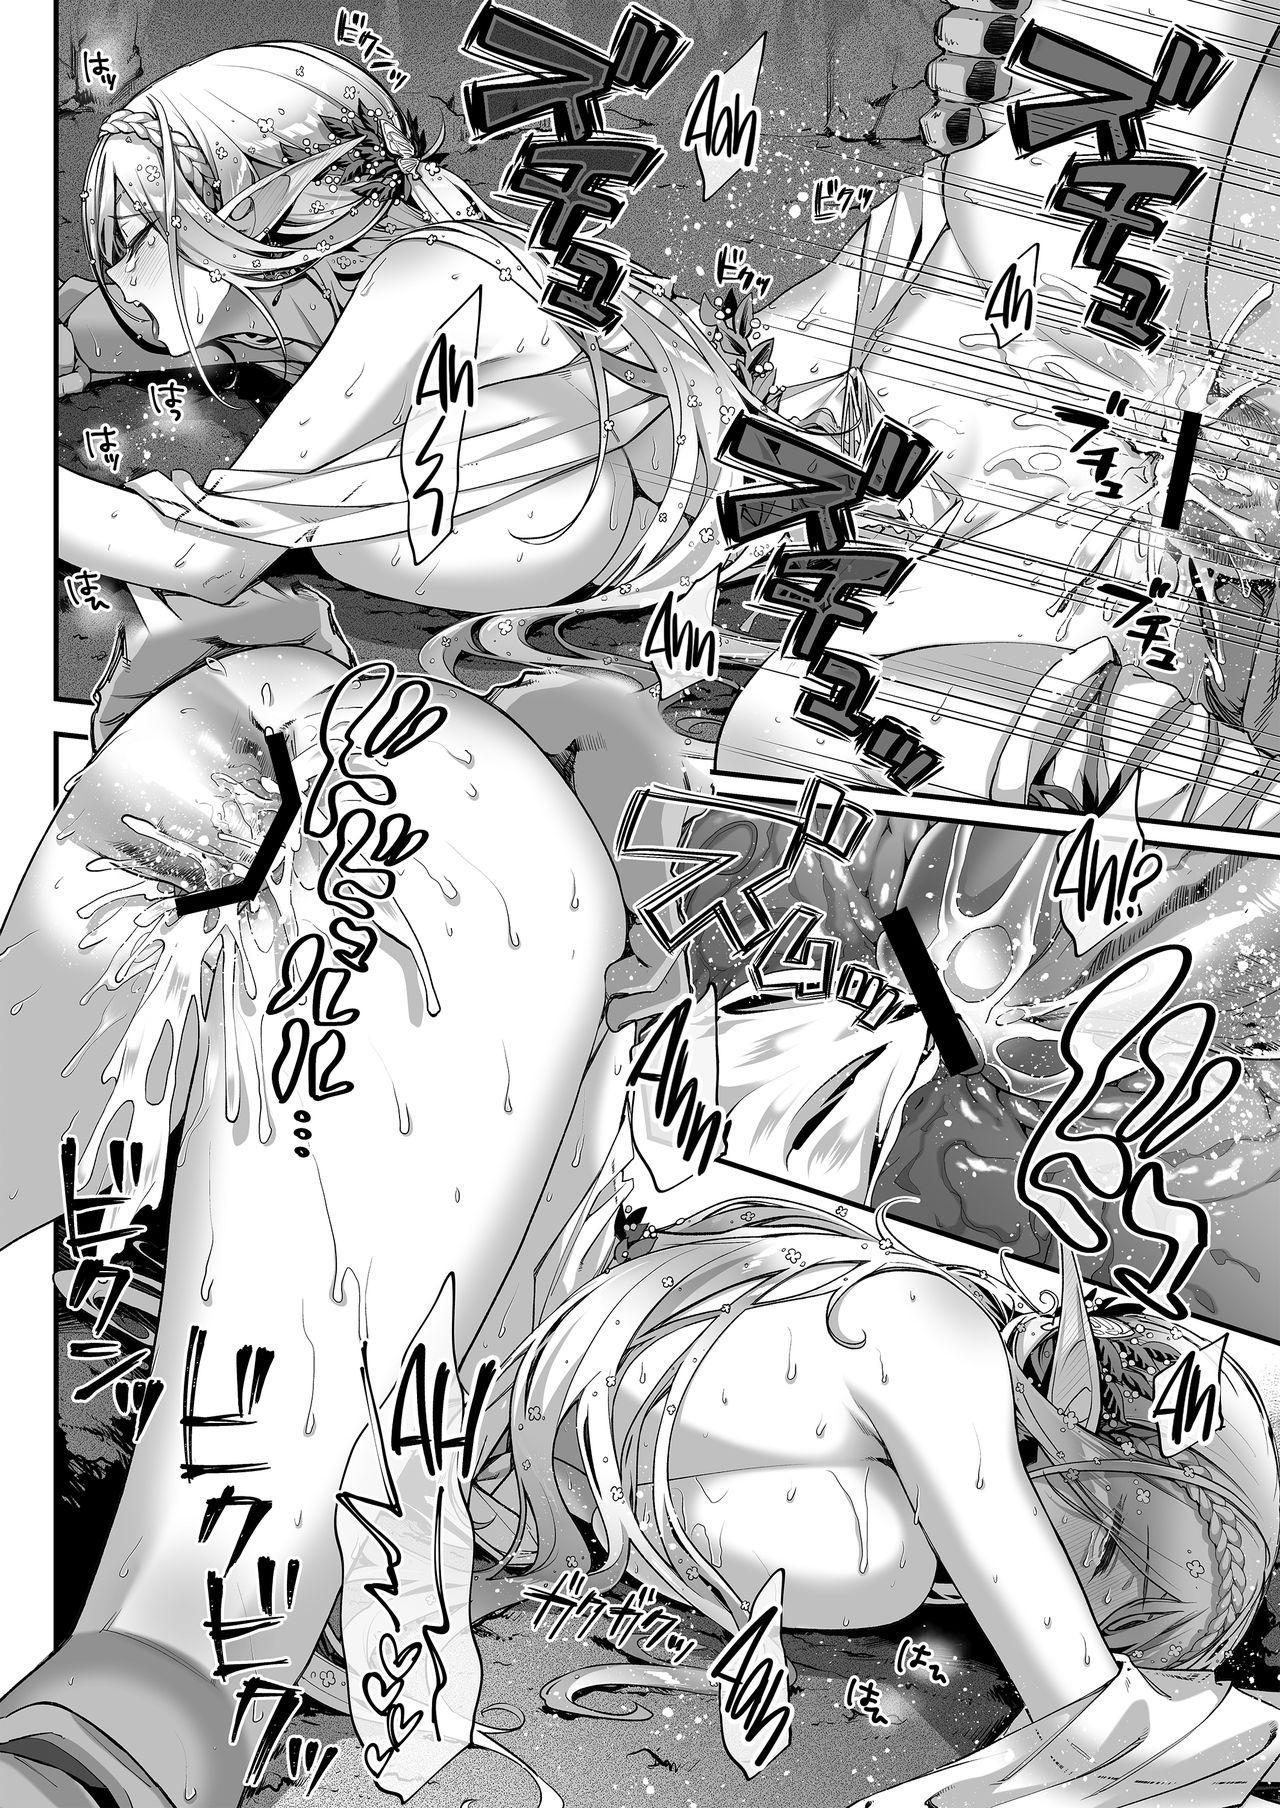 [Ichinose Land] Midara na Elf-san wa Orc-kun ga Osuki | The Lewd Elf likes the Orc [English] [RedLantern] [Digital] 10